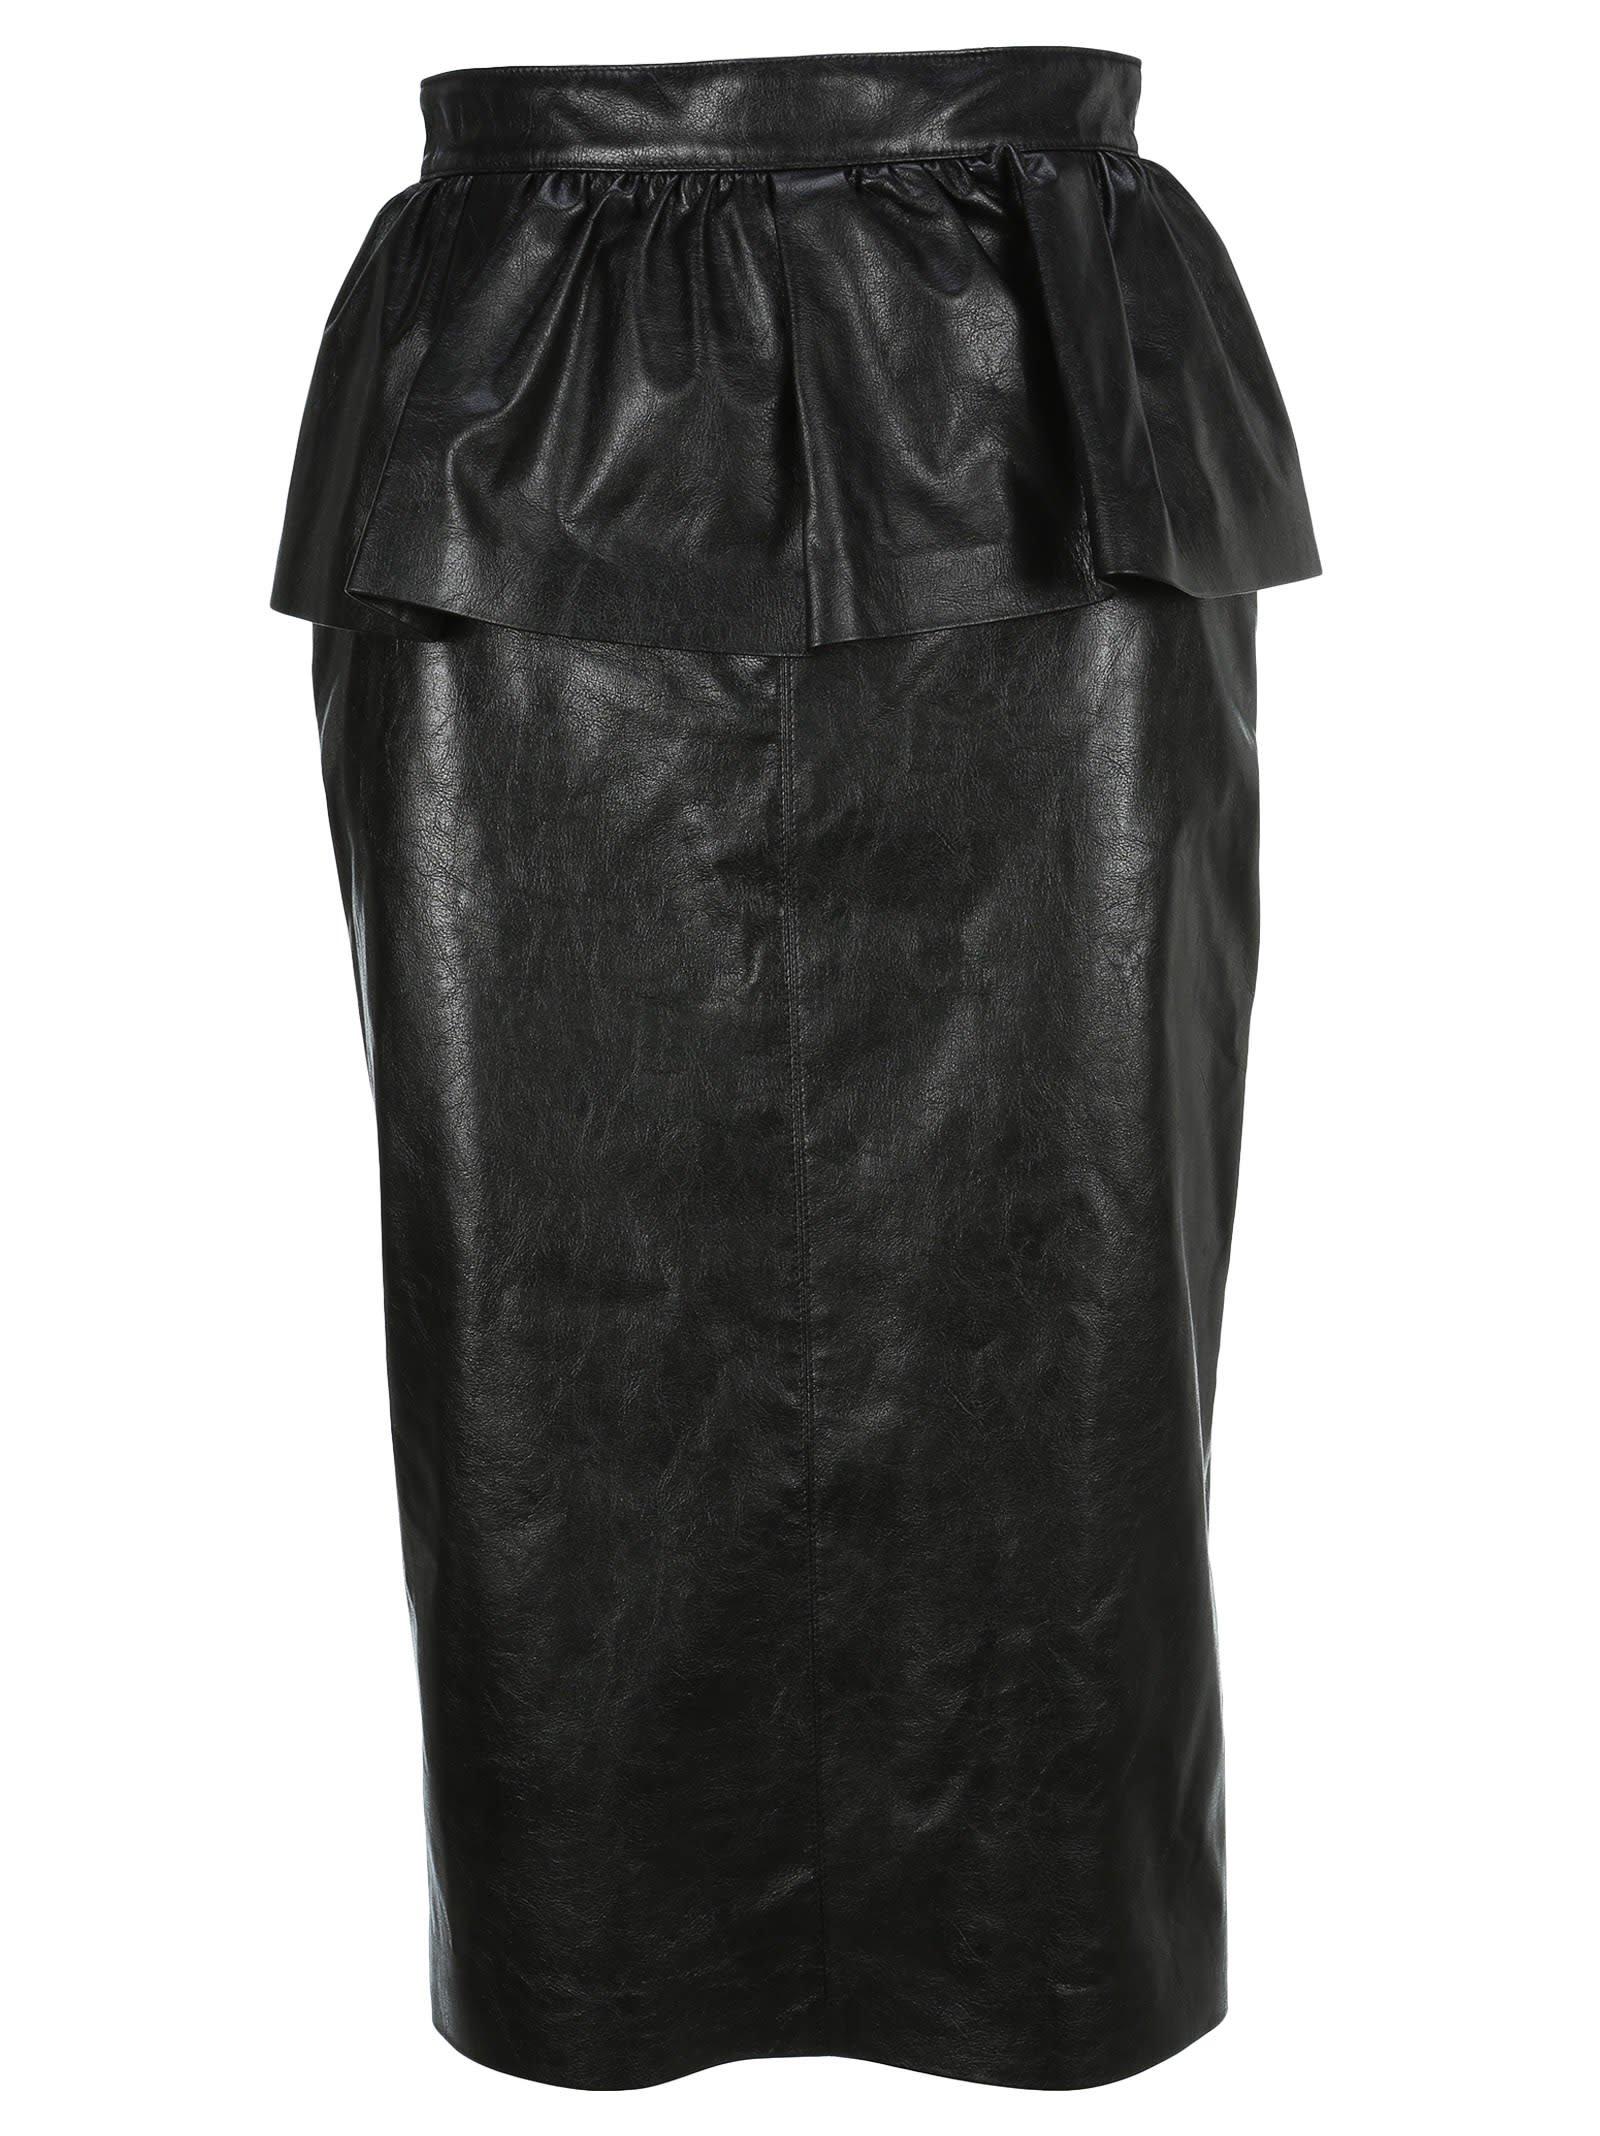 Msgm Ruffled Pencil Skirt